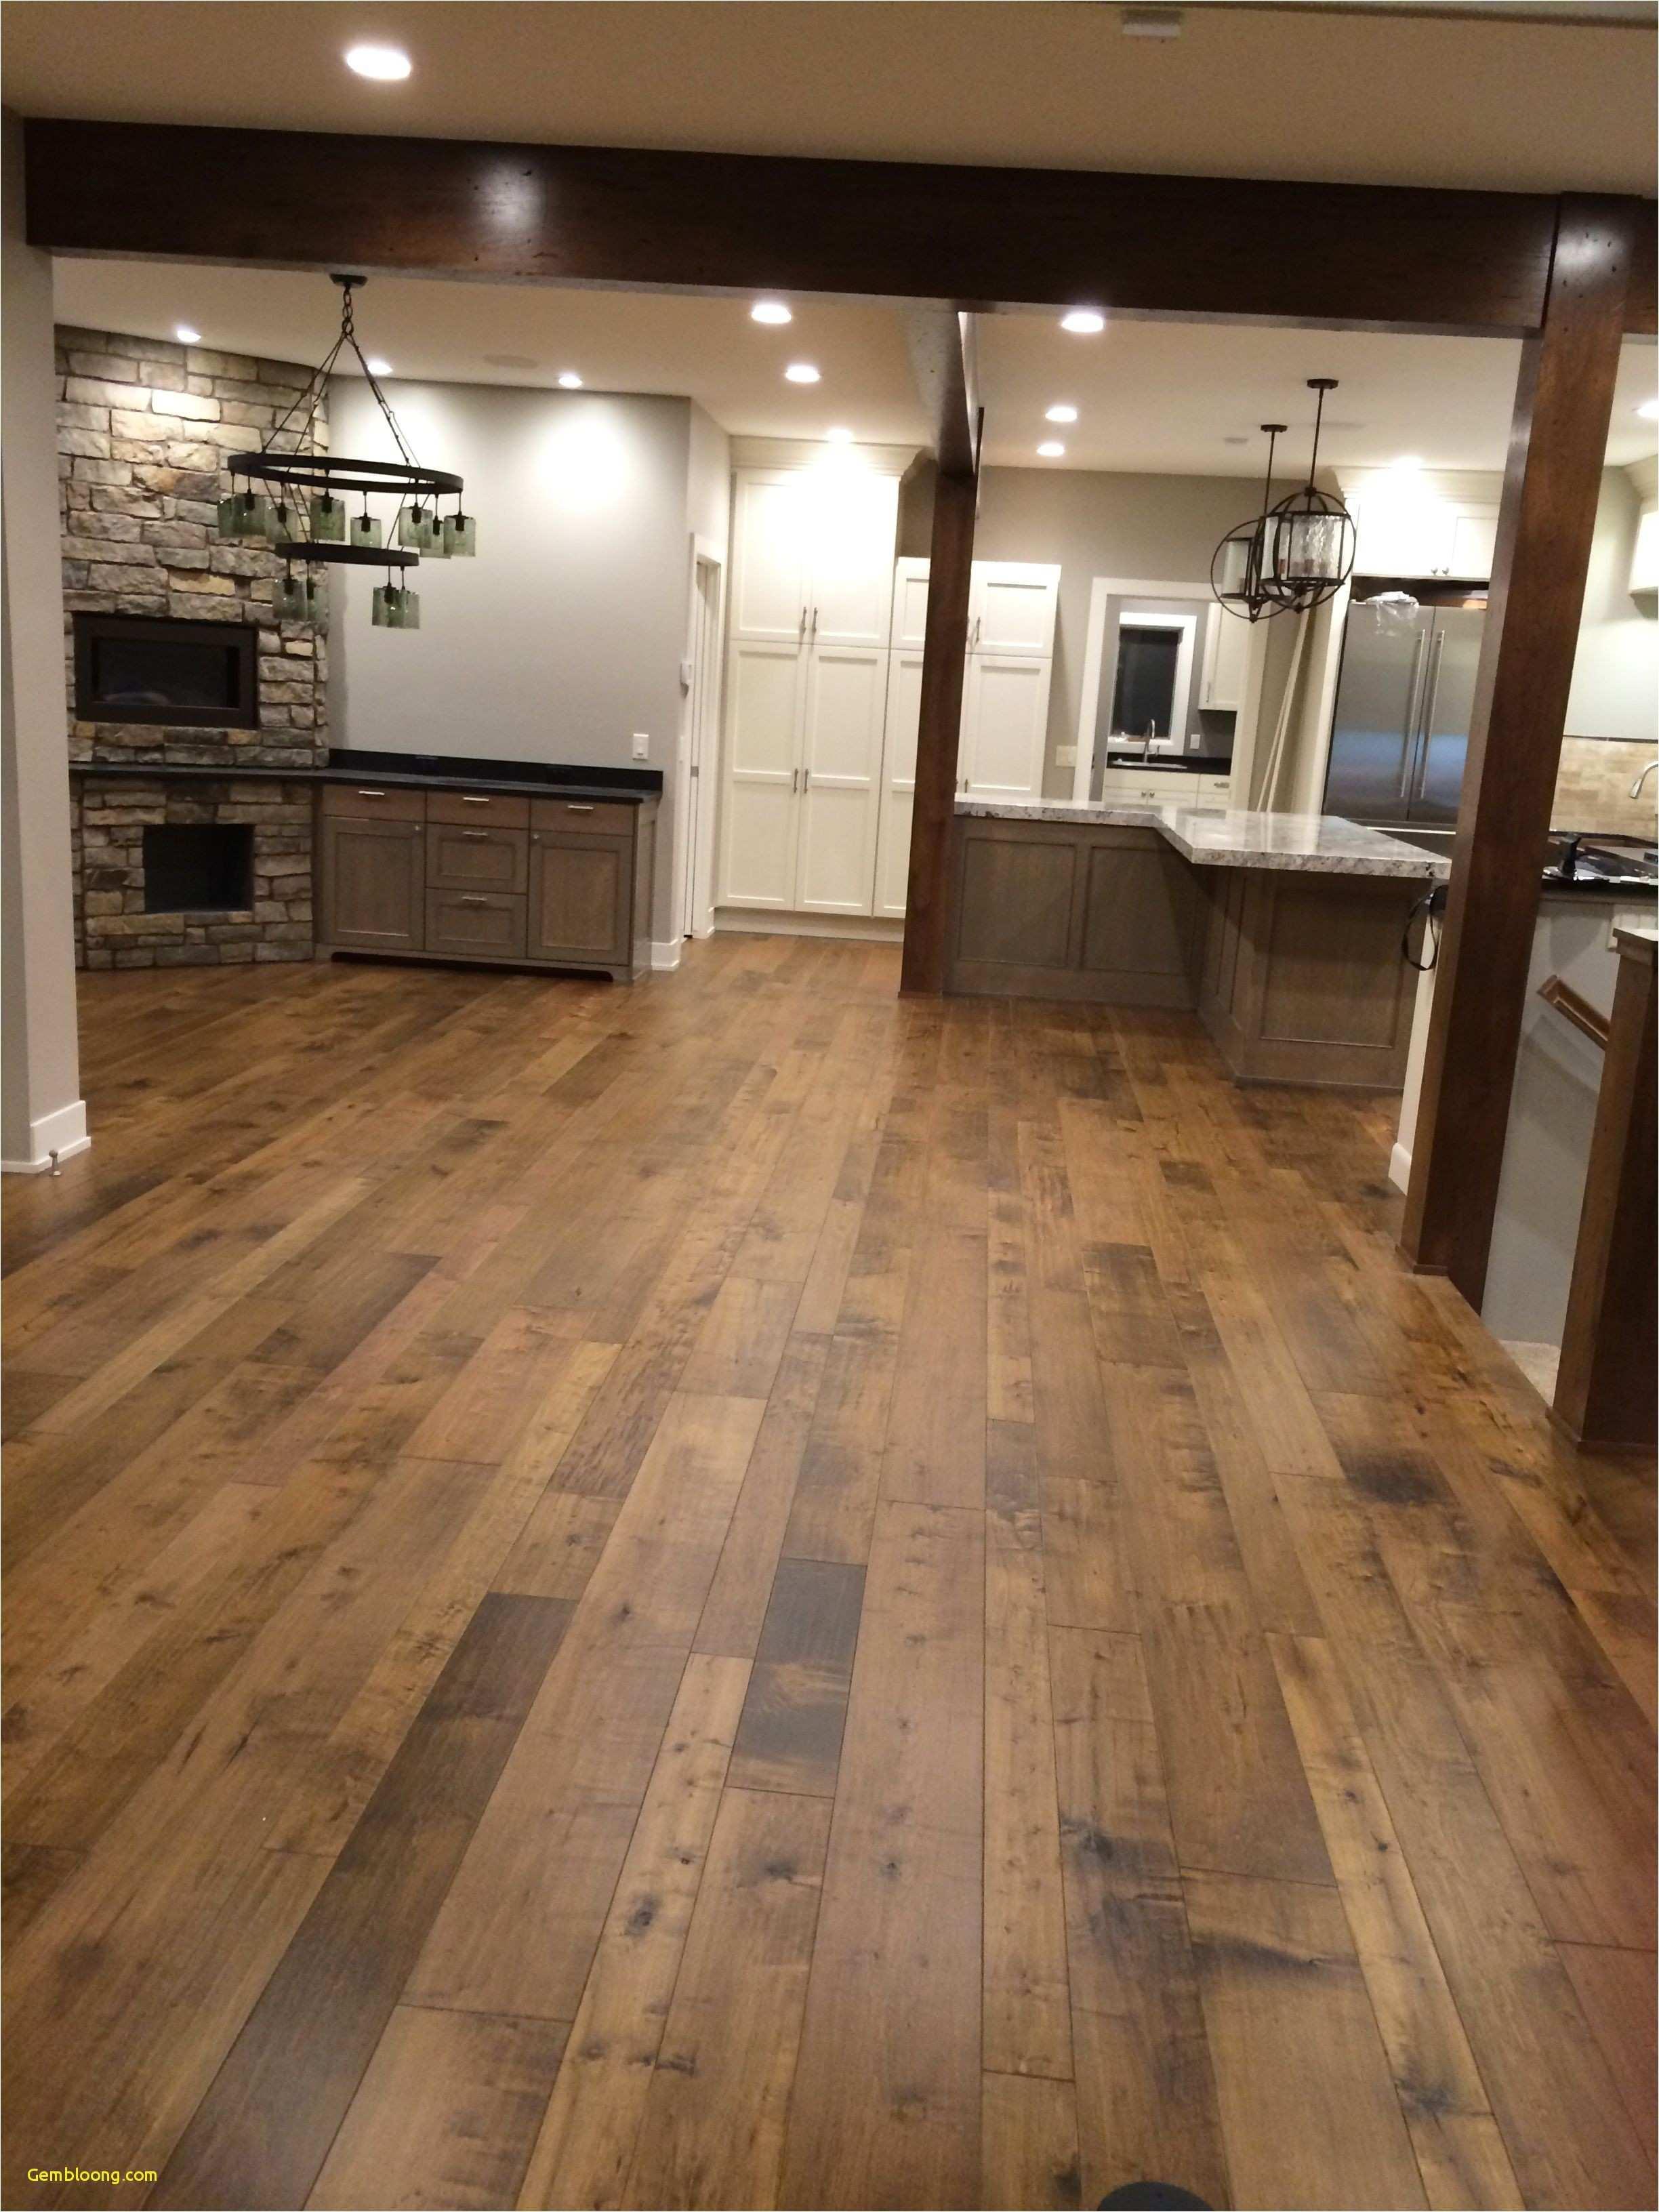 wholesale hardwood flooring of wood for floors facesinnature throughout hardwood flooring stores near me hardwood flooring panies near me flooring sale near me stock 0d